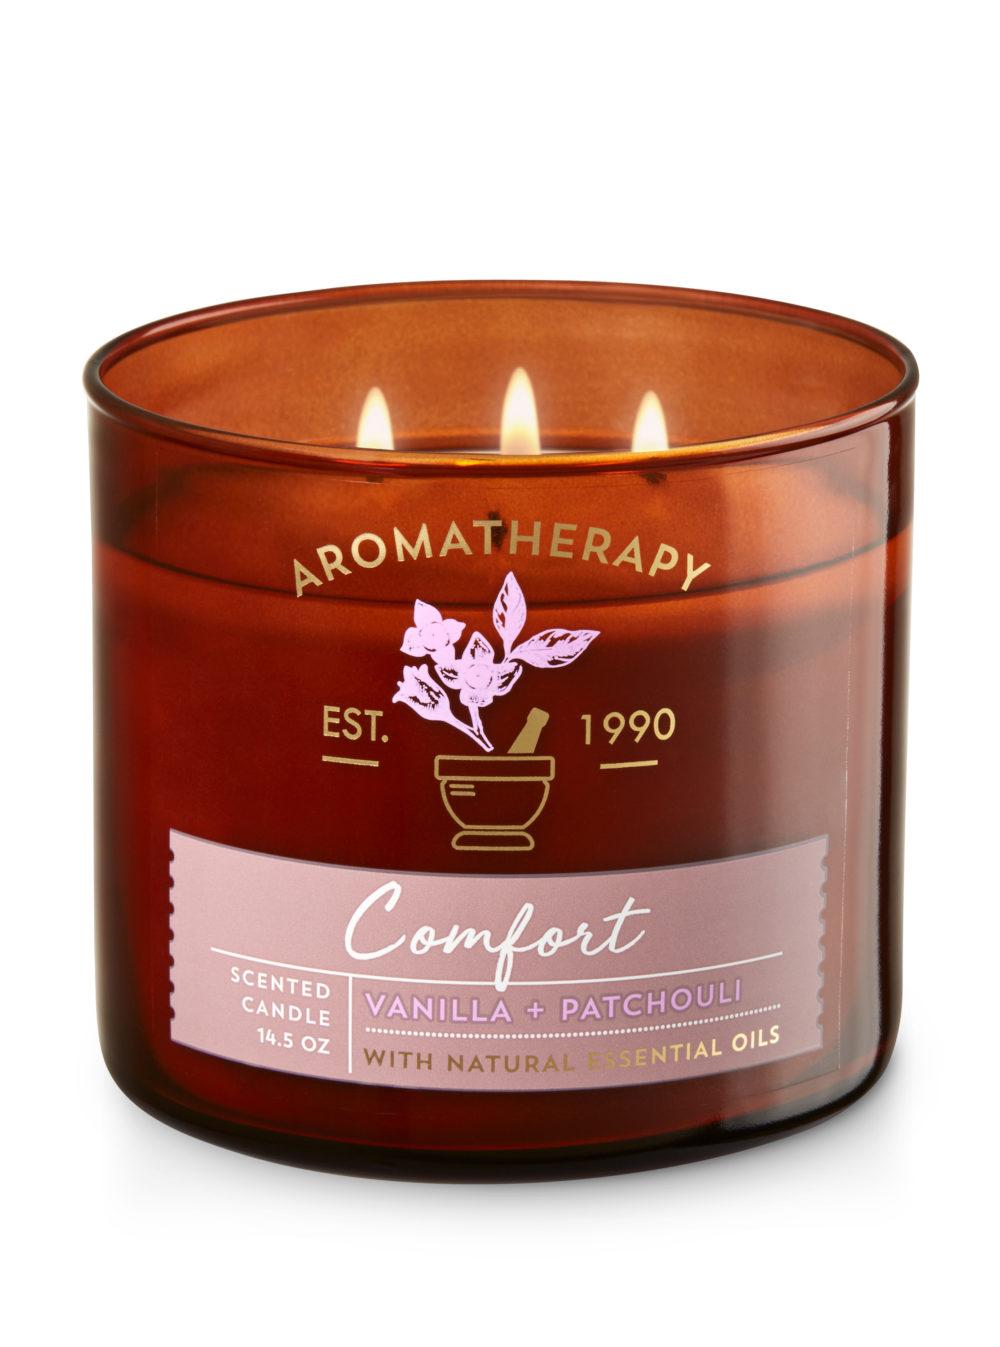 Comfort-Vanilla-Patchouli-3-Wick-Candle-e1504214909451.jpg